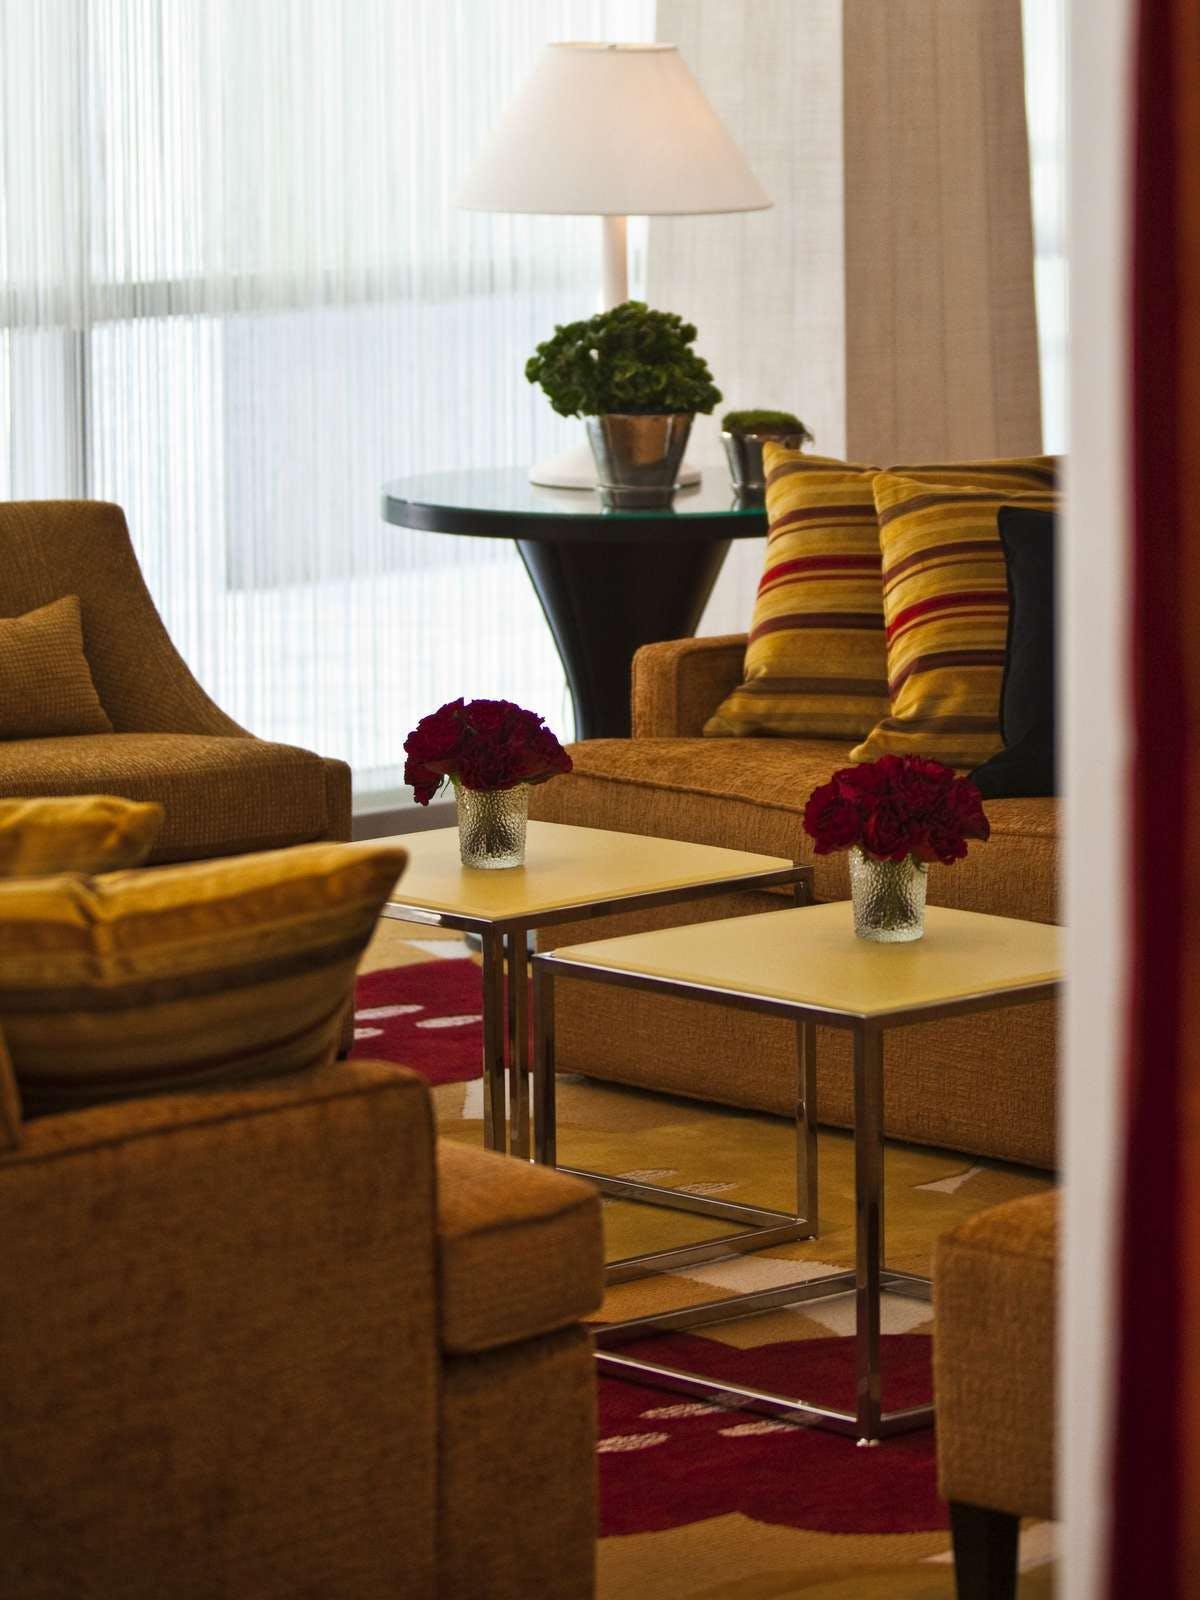 Hotel Palomar Chicago, A Kimpton Hotel